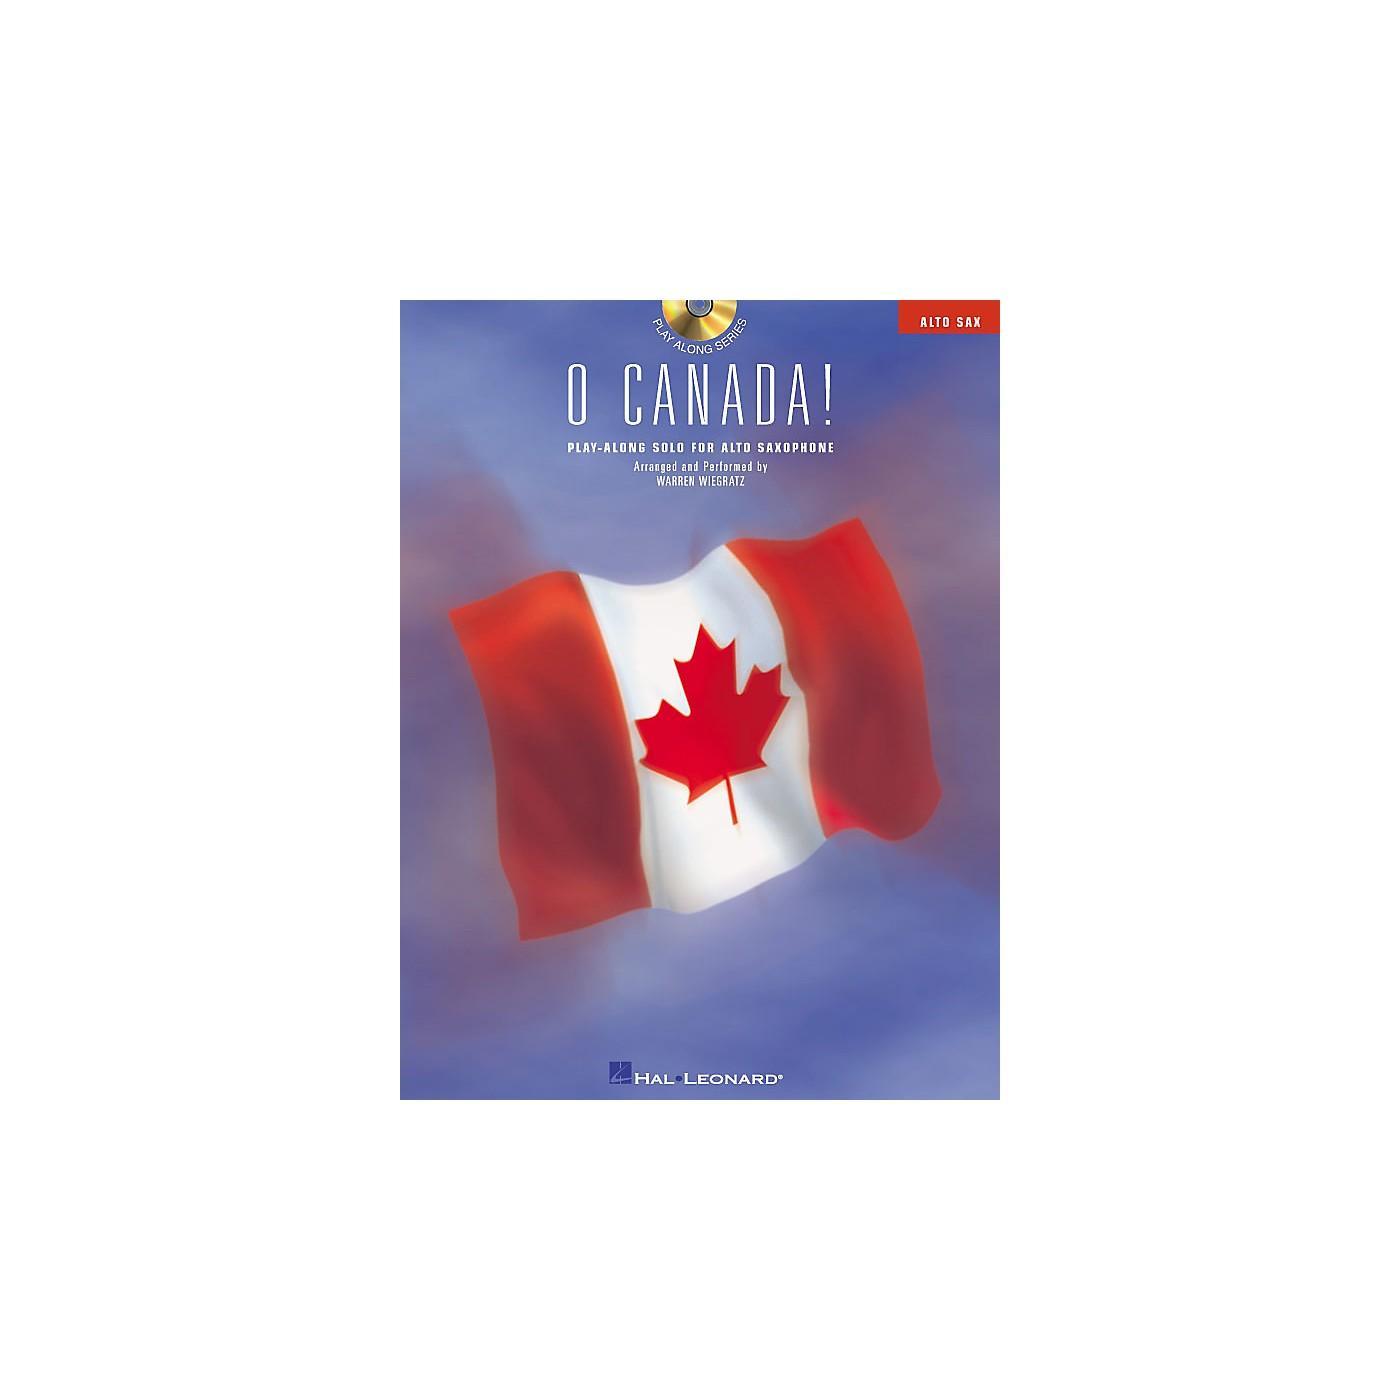 Hal Leonard O Canada! (Play-Along Solo for Alto Saxophone) Instrumental Folio Series CD thumbnail